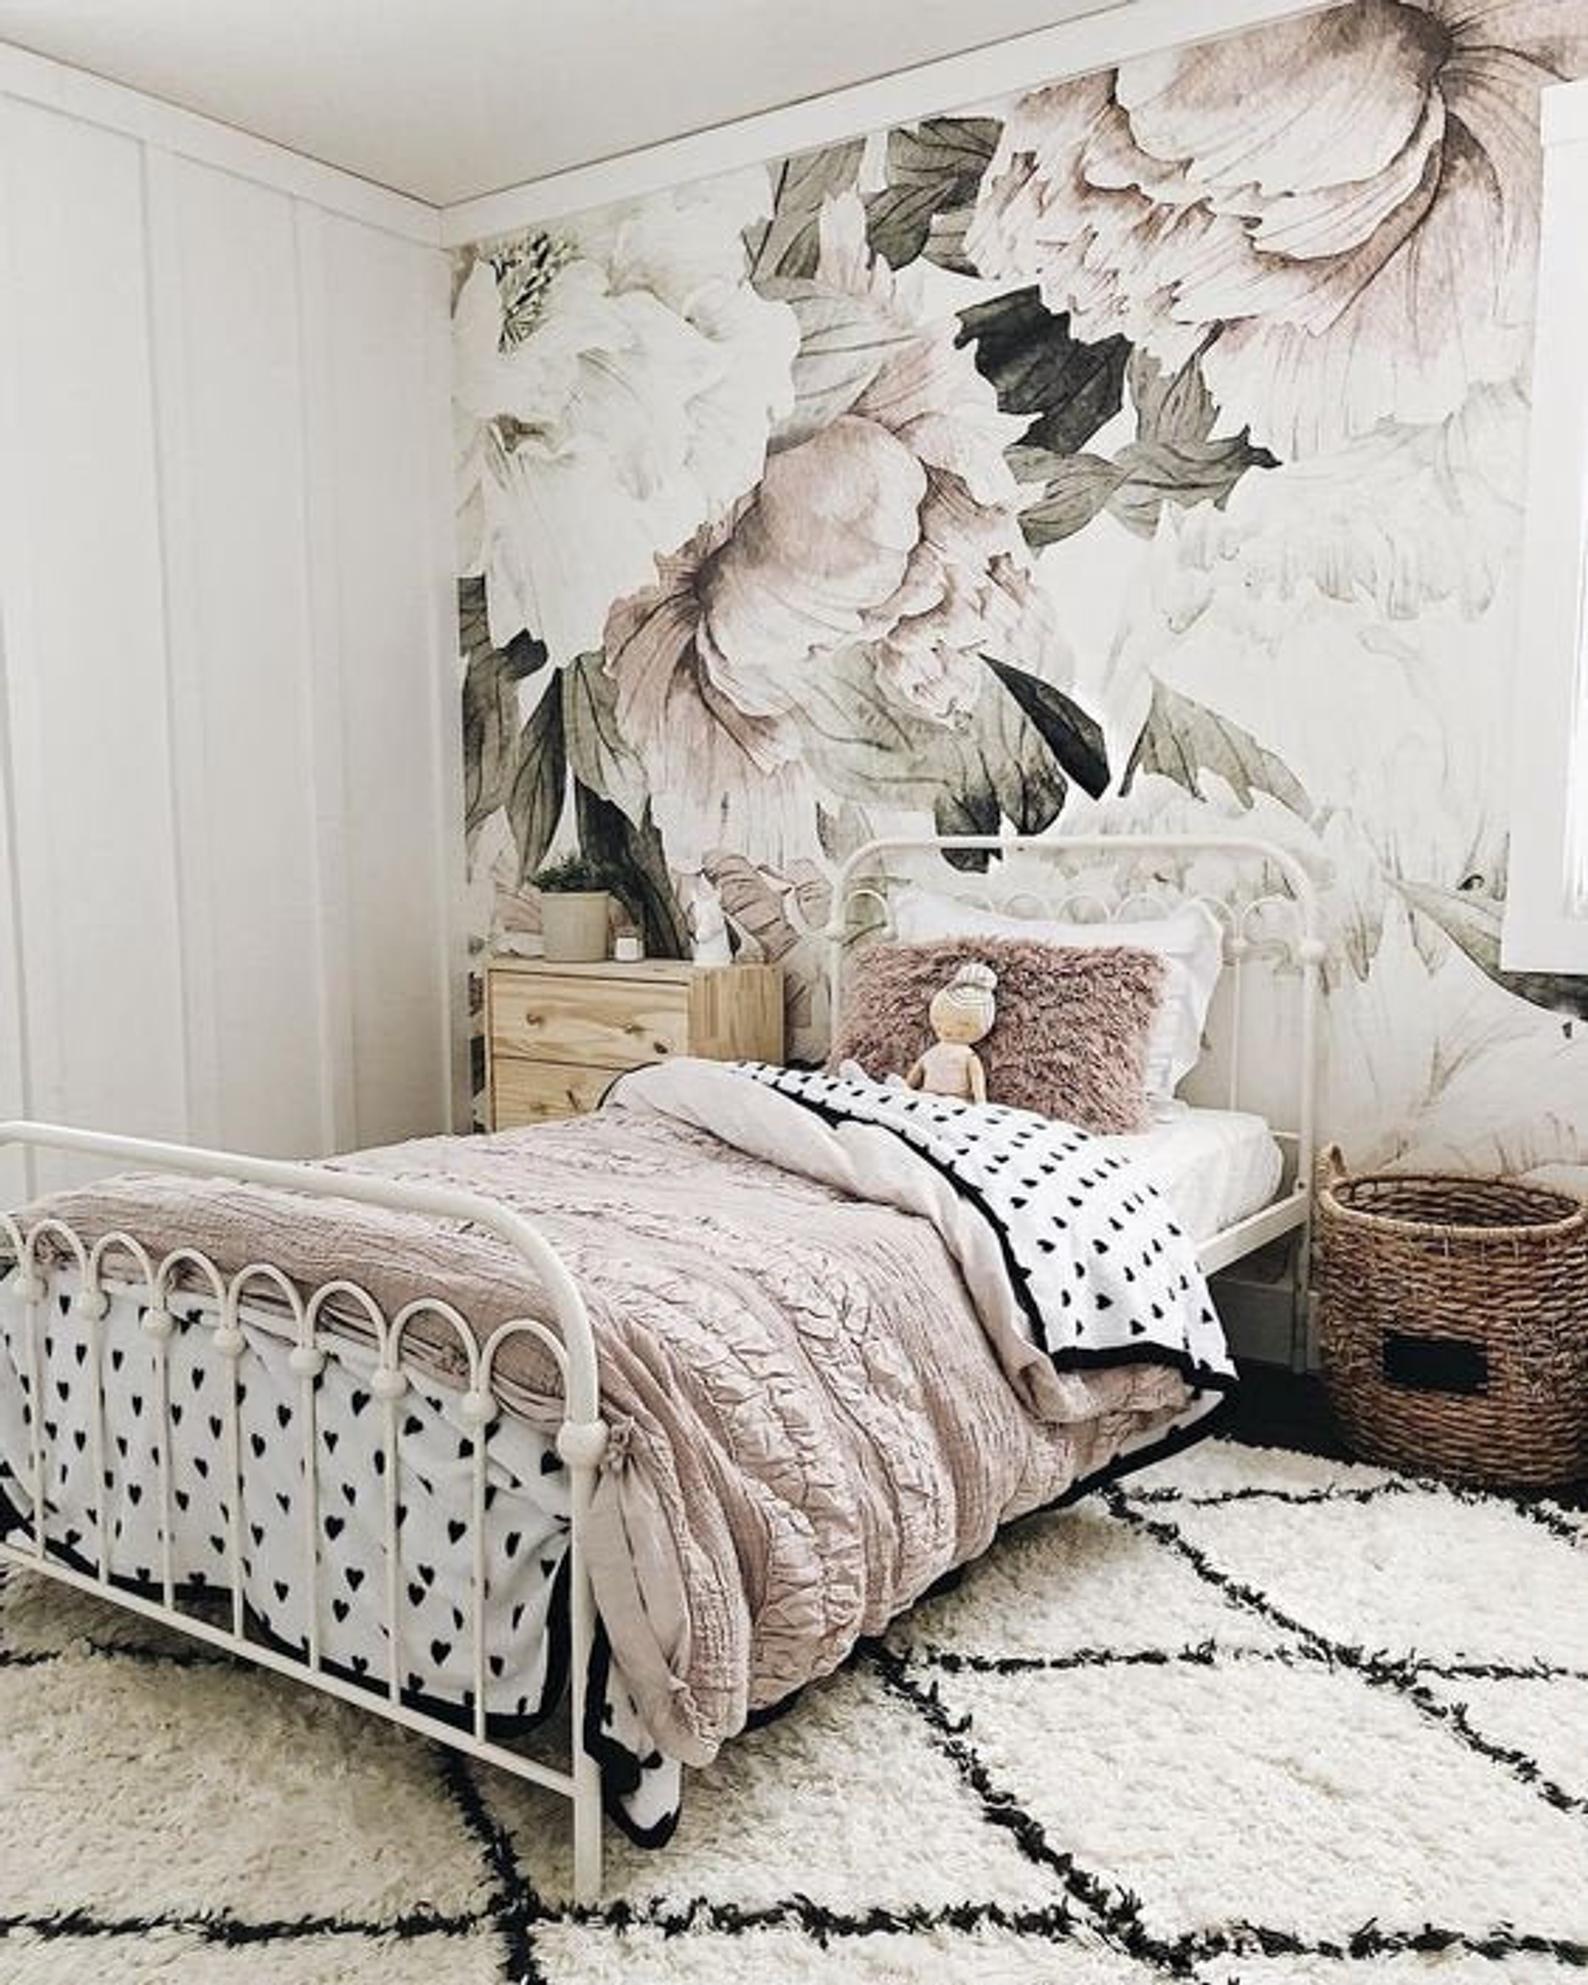 Floral Wallpaper Removable Wallpaper Peel And Stick Wallpaper Etsy Floral Wallpaper Removable Wallpaper Self Adhesive Wallpaper